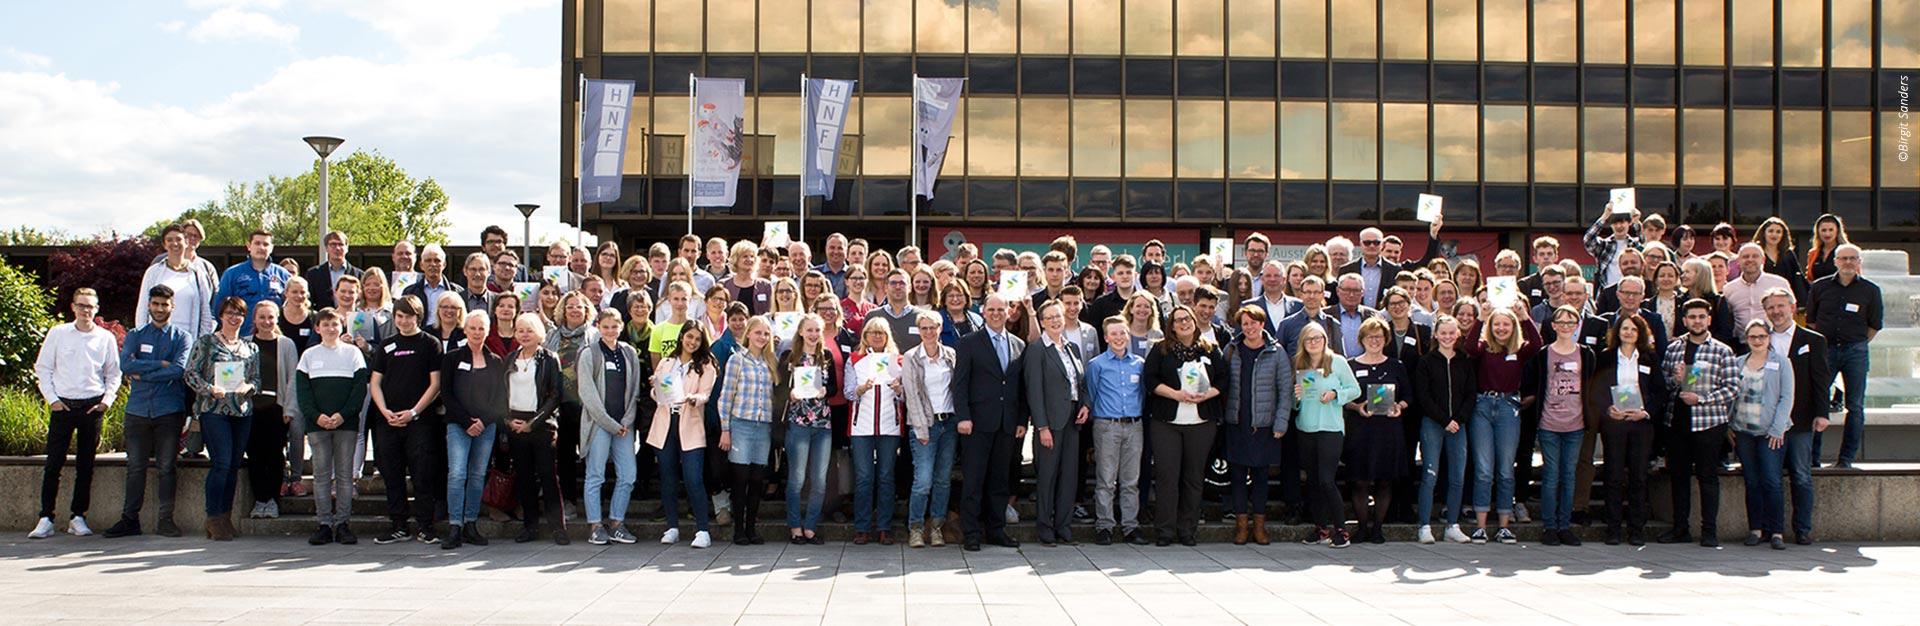 netzwerk-berufswahlsiegel-Blog-Siegel-Ostwestfalen-Lippe-Gesamt